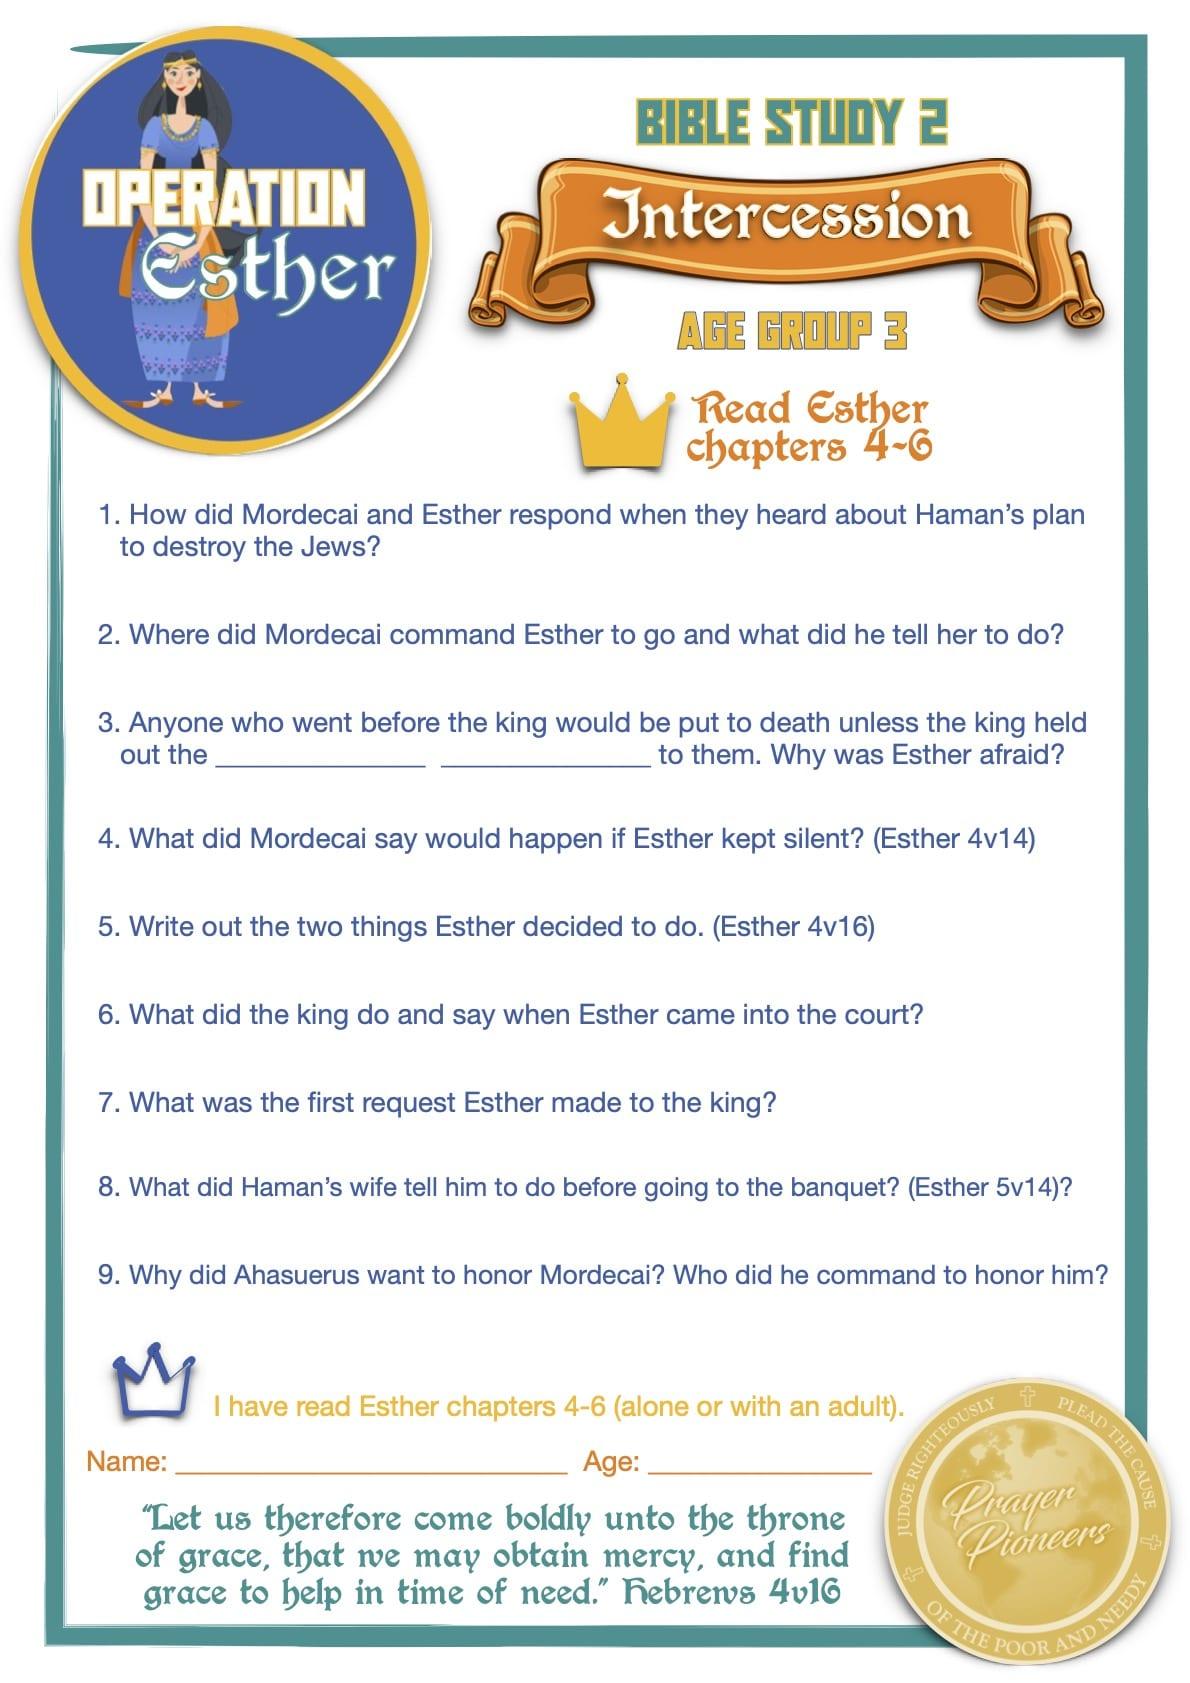 OE - Bible Study 2 - Age Group 3